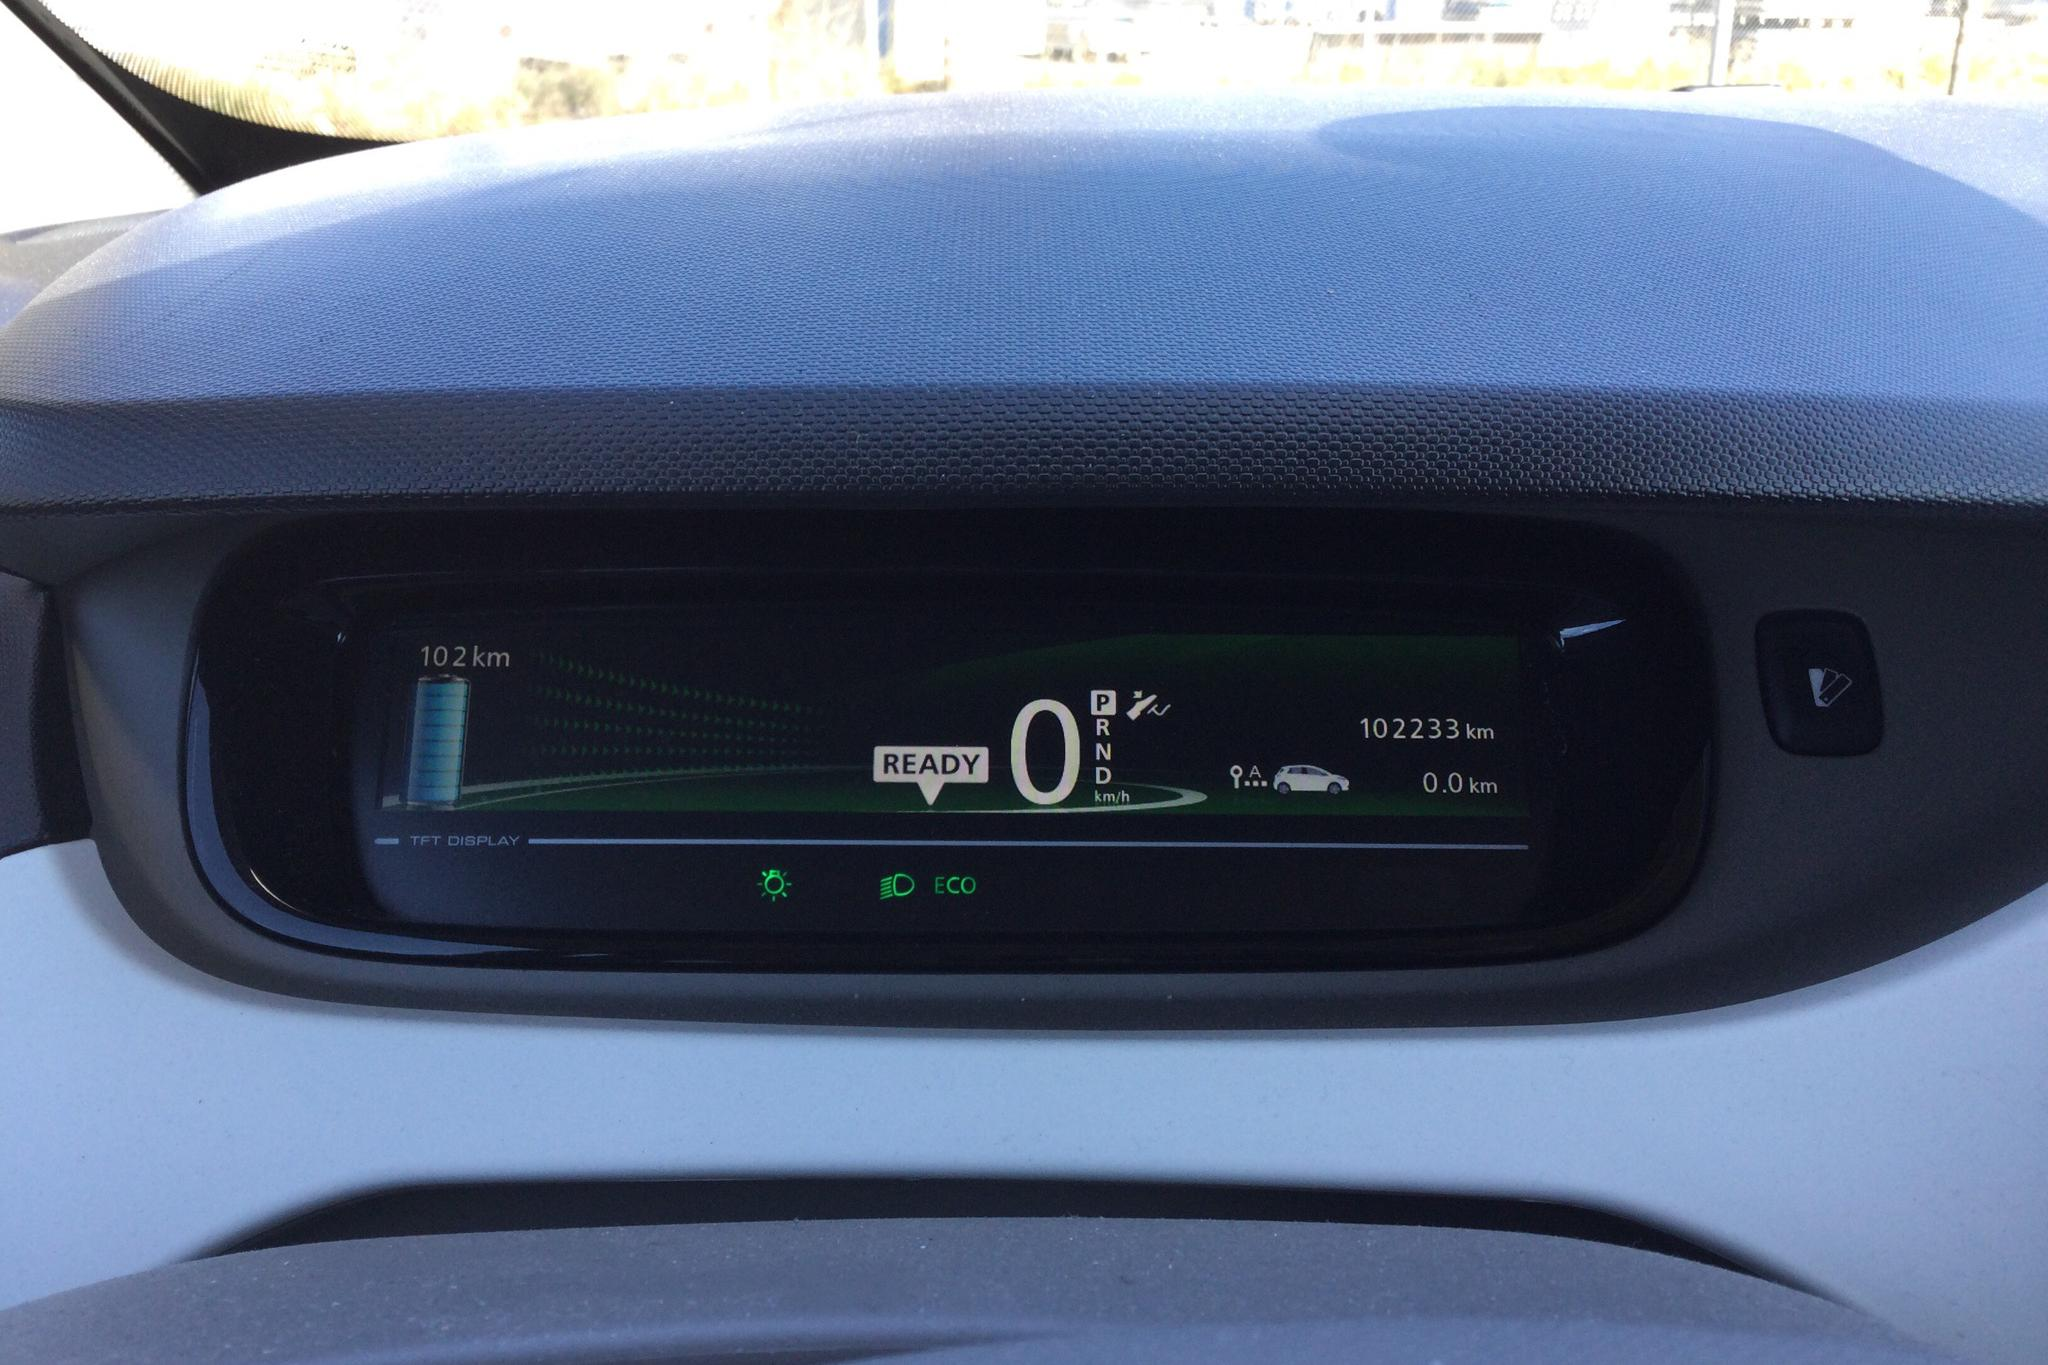 Renault Zoe 22 kWh (88hk) - 102 240 km - Automatic - white - 2017